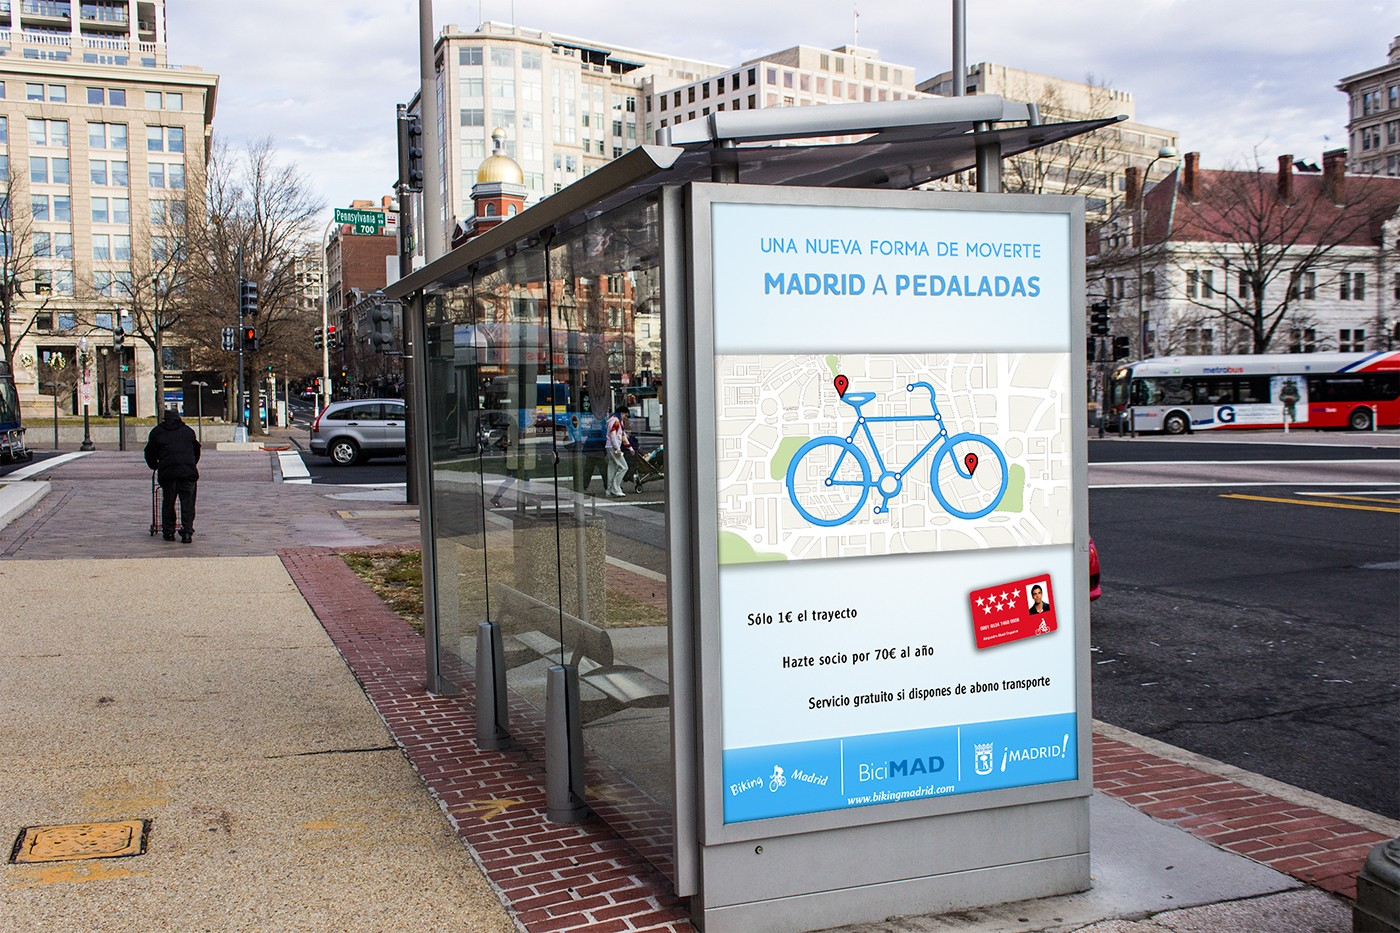 Biking Madrid